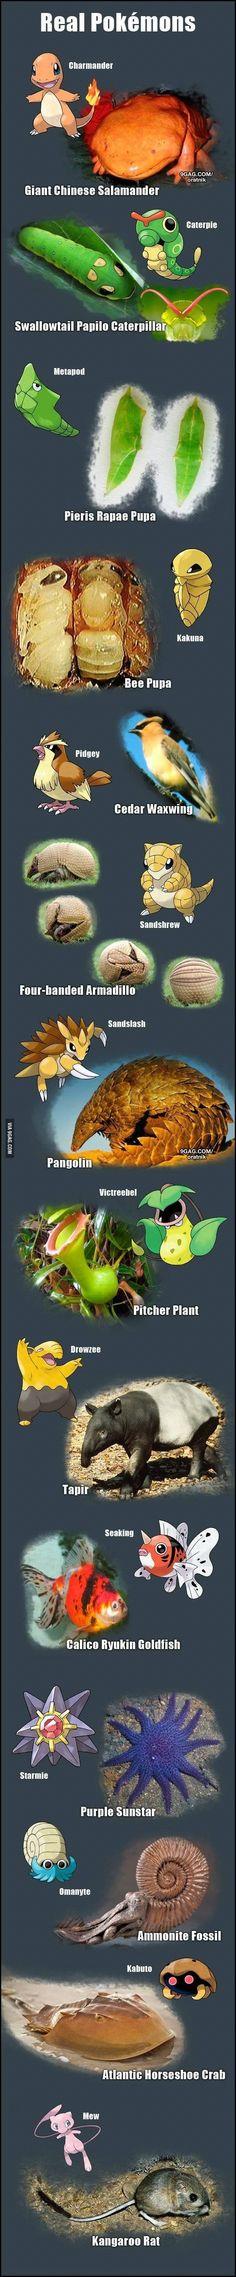 Pokemon in real life